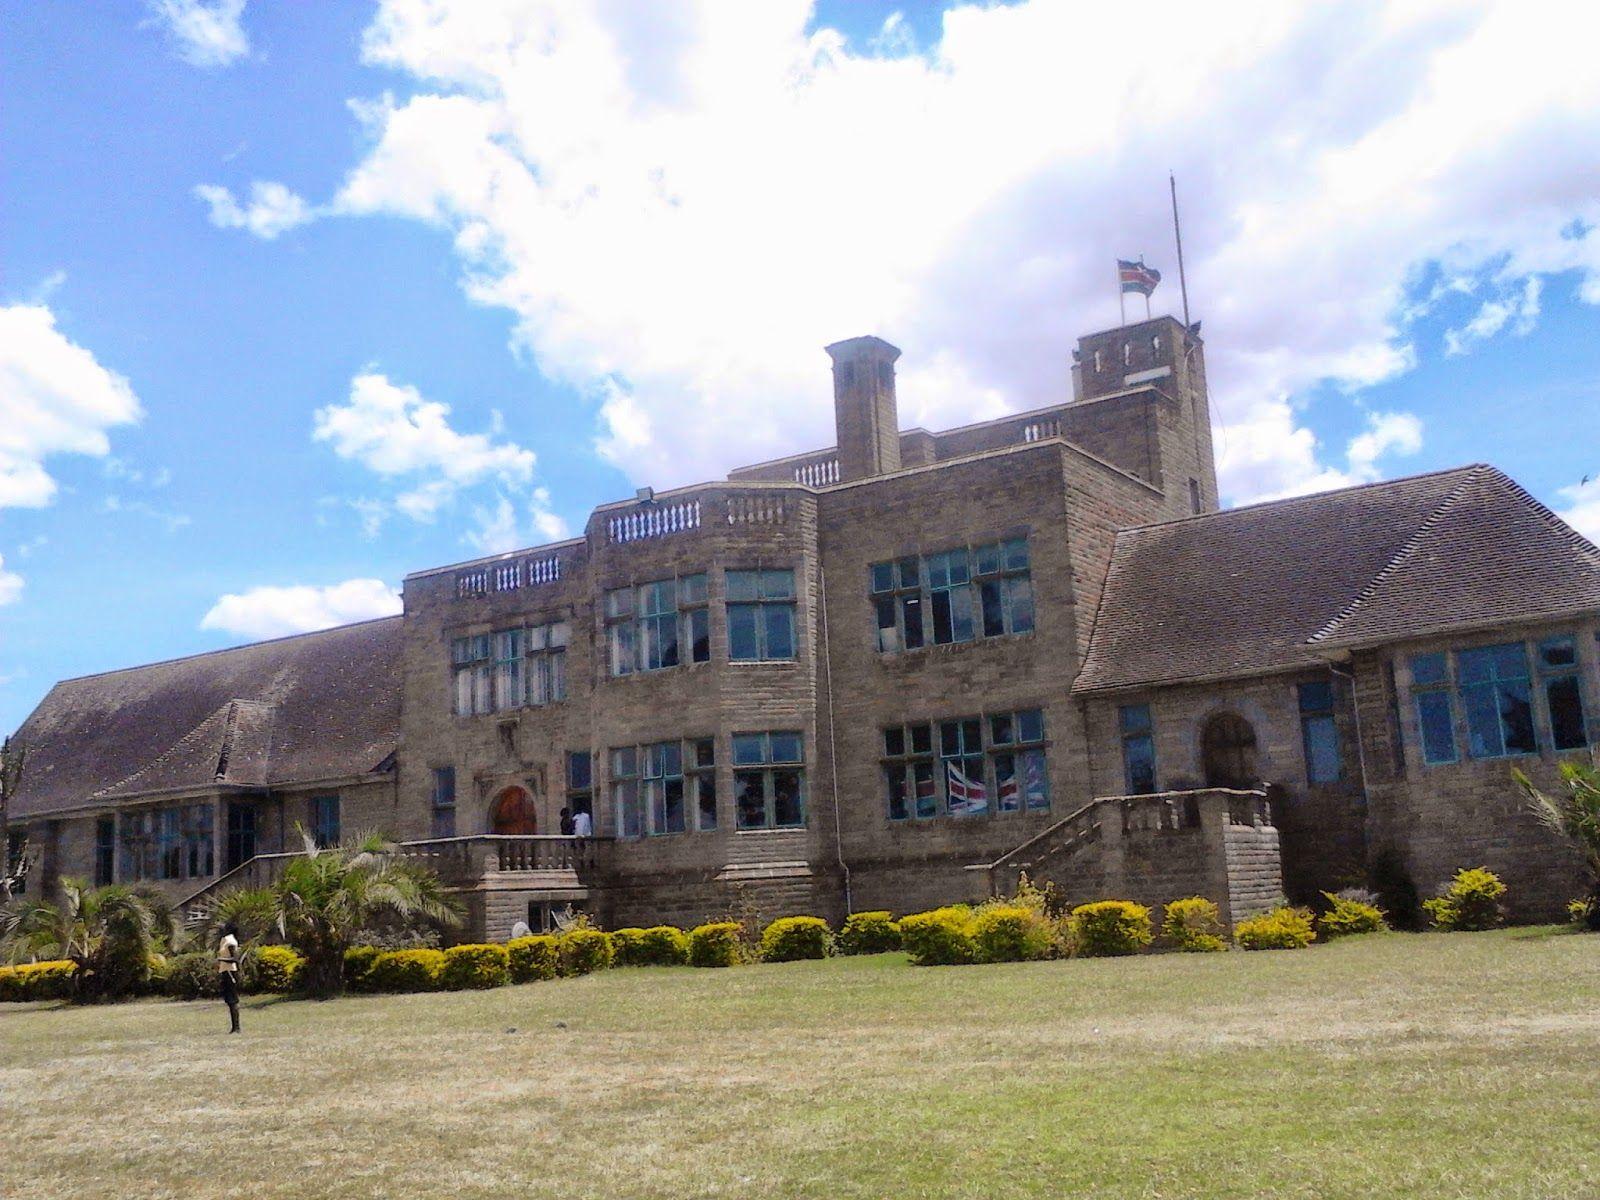 Lord Egerton Castle - Egerton University | Castle, Mansions, Scenery